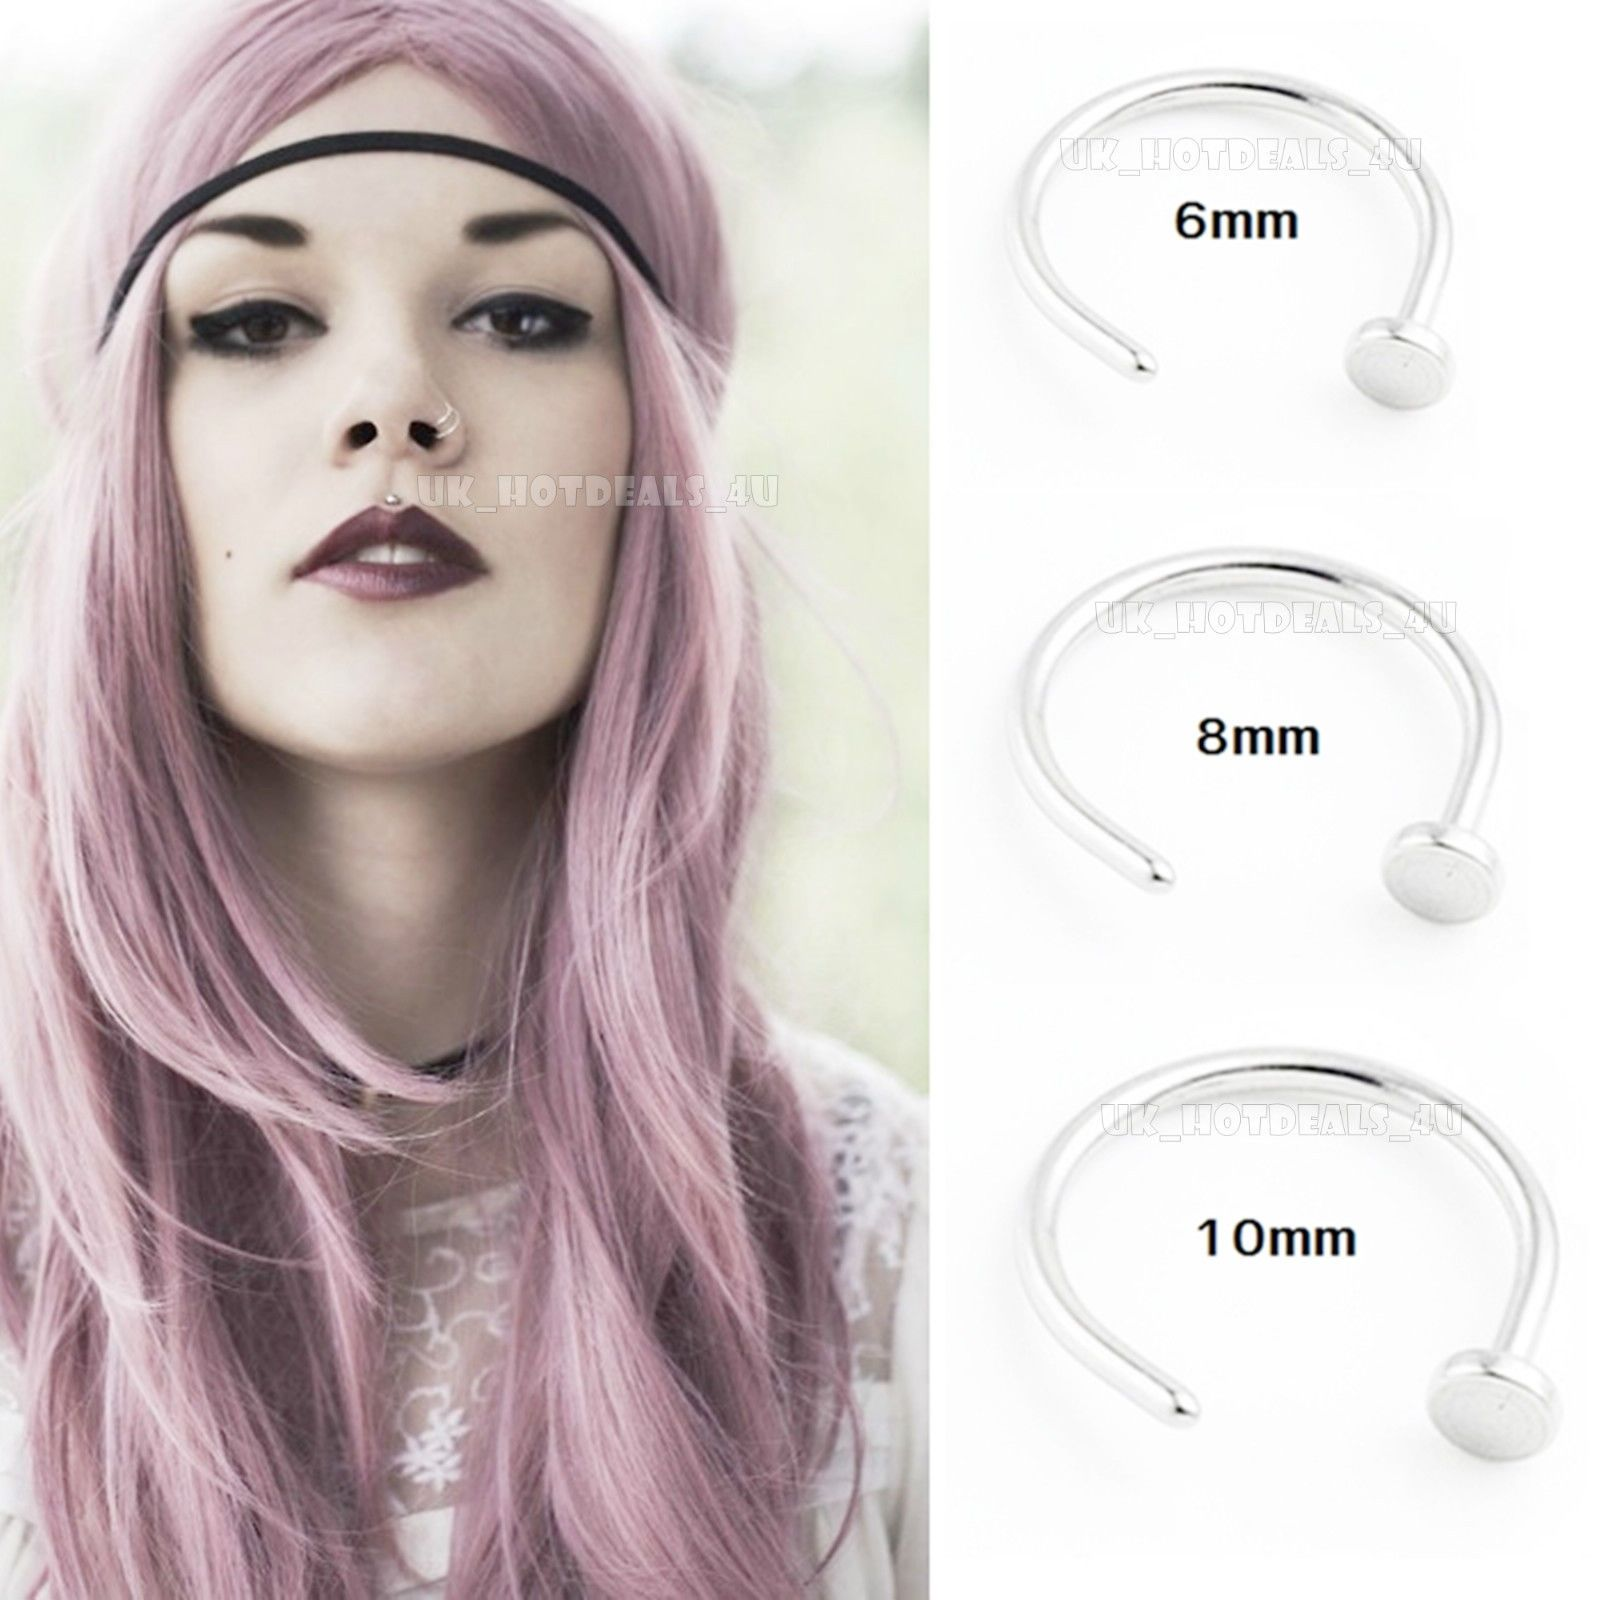 Nose piercing 6mm  UkHotdealsu Body Piercing Jewelry ebay Fashion